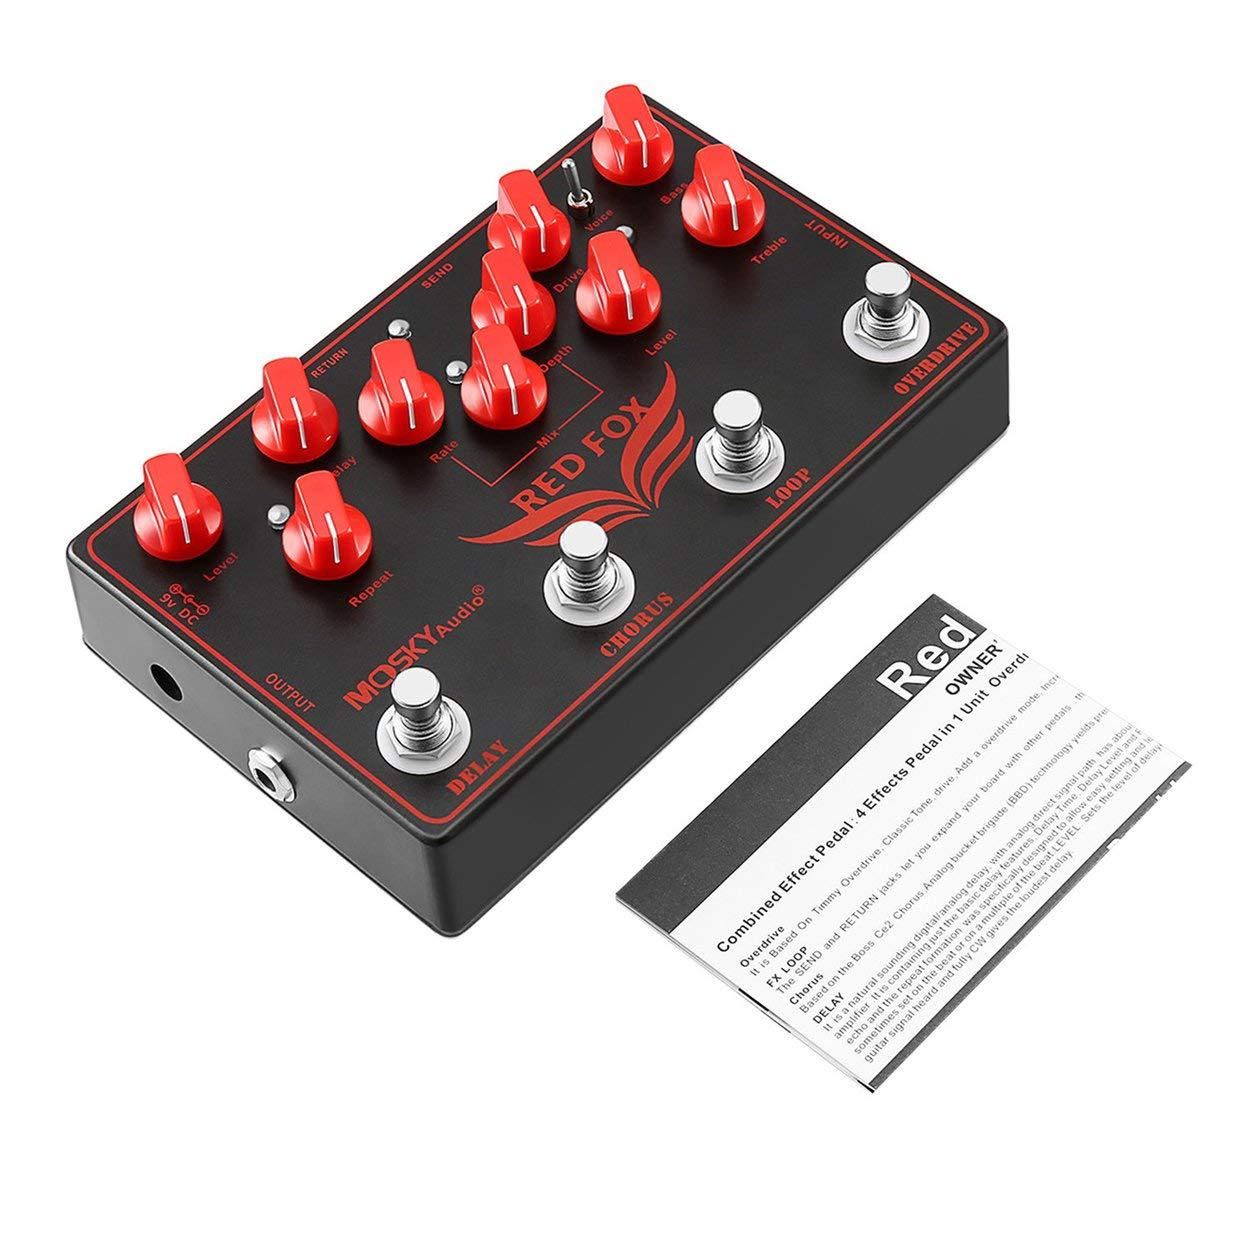 MOSKYAUDIO Blue Delay Tragbare Mini Analog Delay Gitarre Effektpedal 1/4'Mono-Klinke Professionelle Gitarrenzubehö r ClookYeed